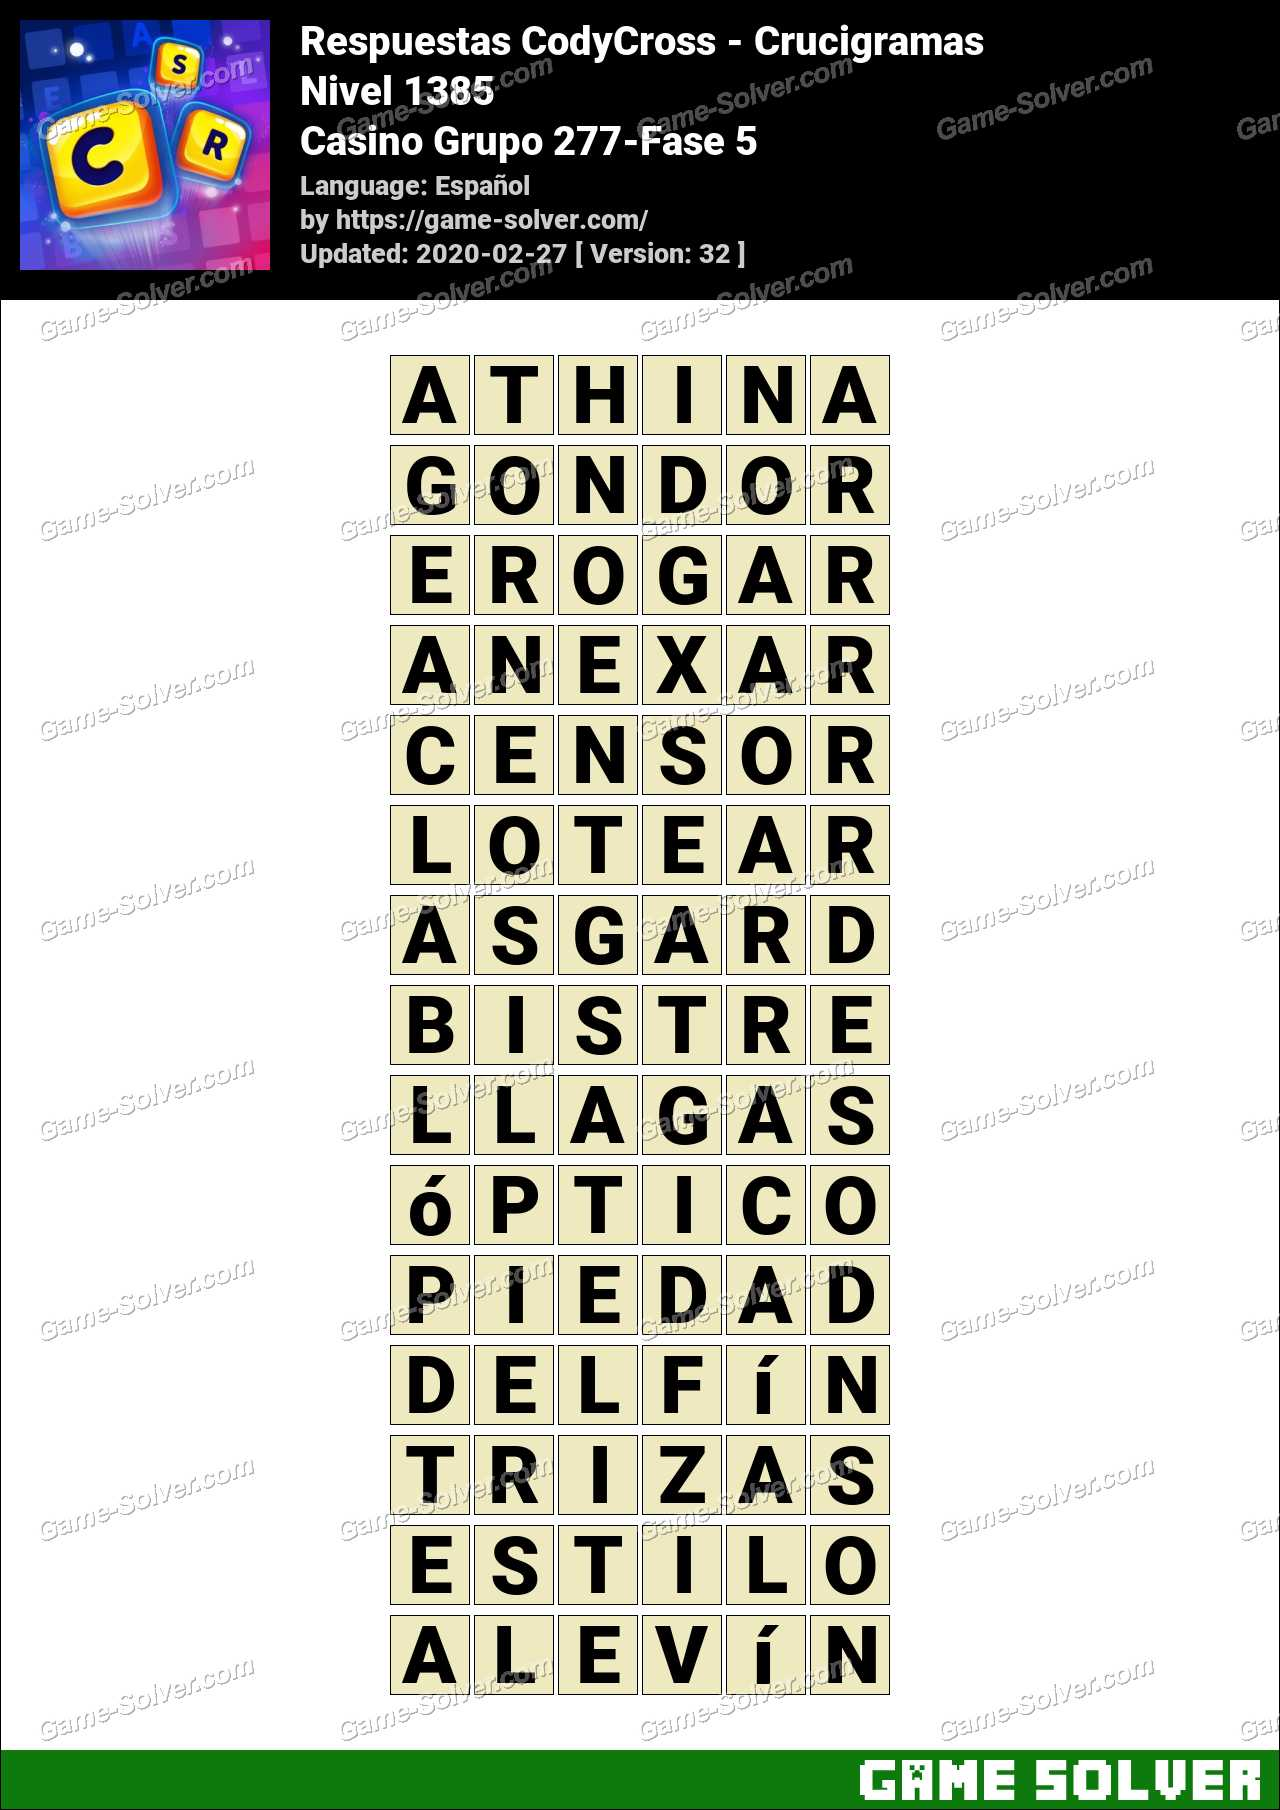 Respuestas CodyCross Casino Grupo 277-Fase 5